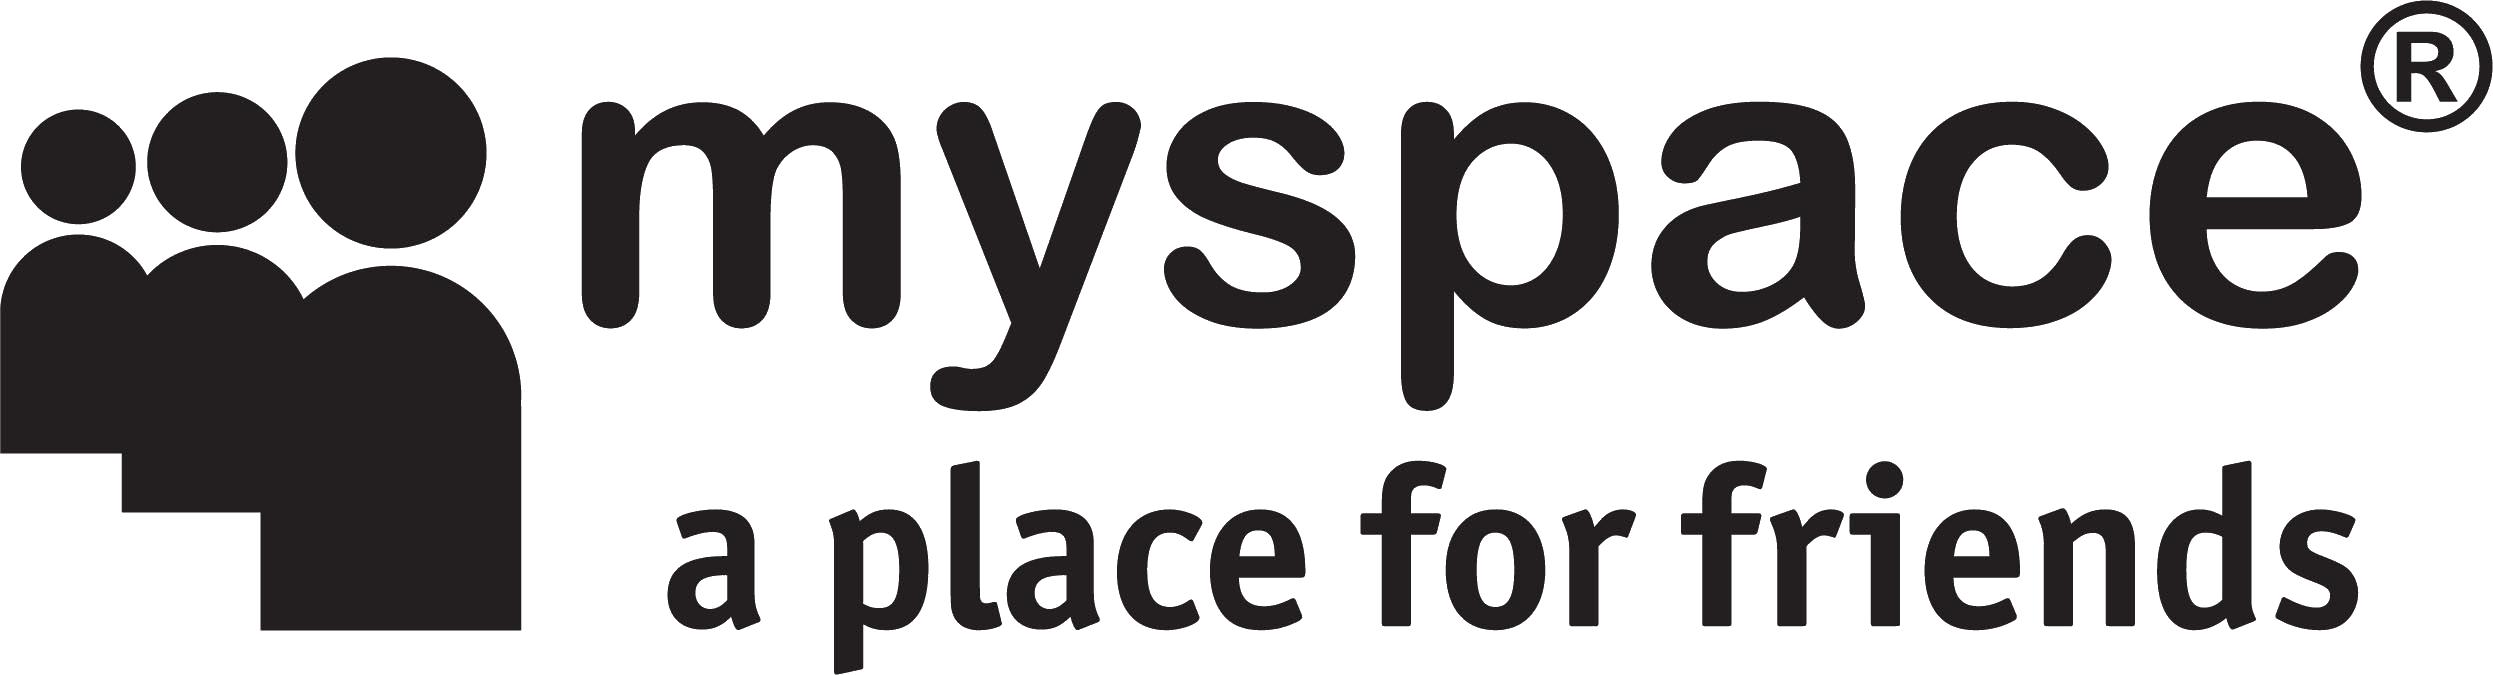 Myspace mobile sucks